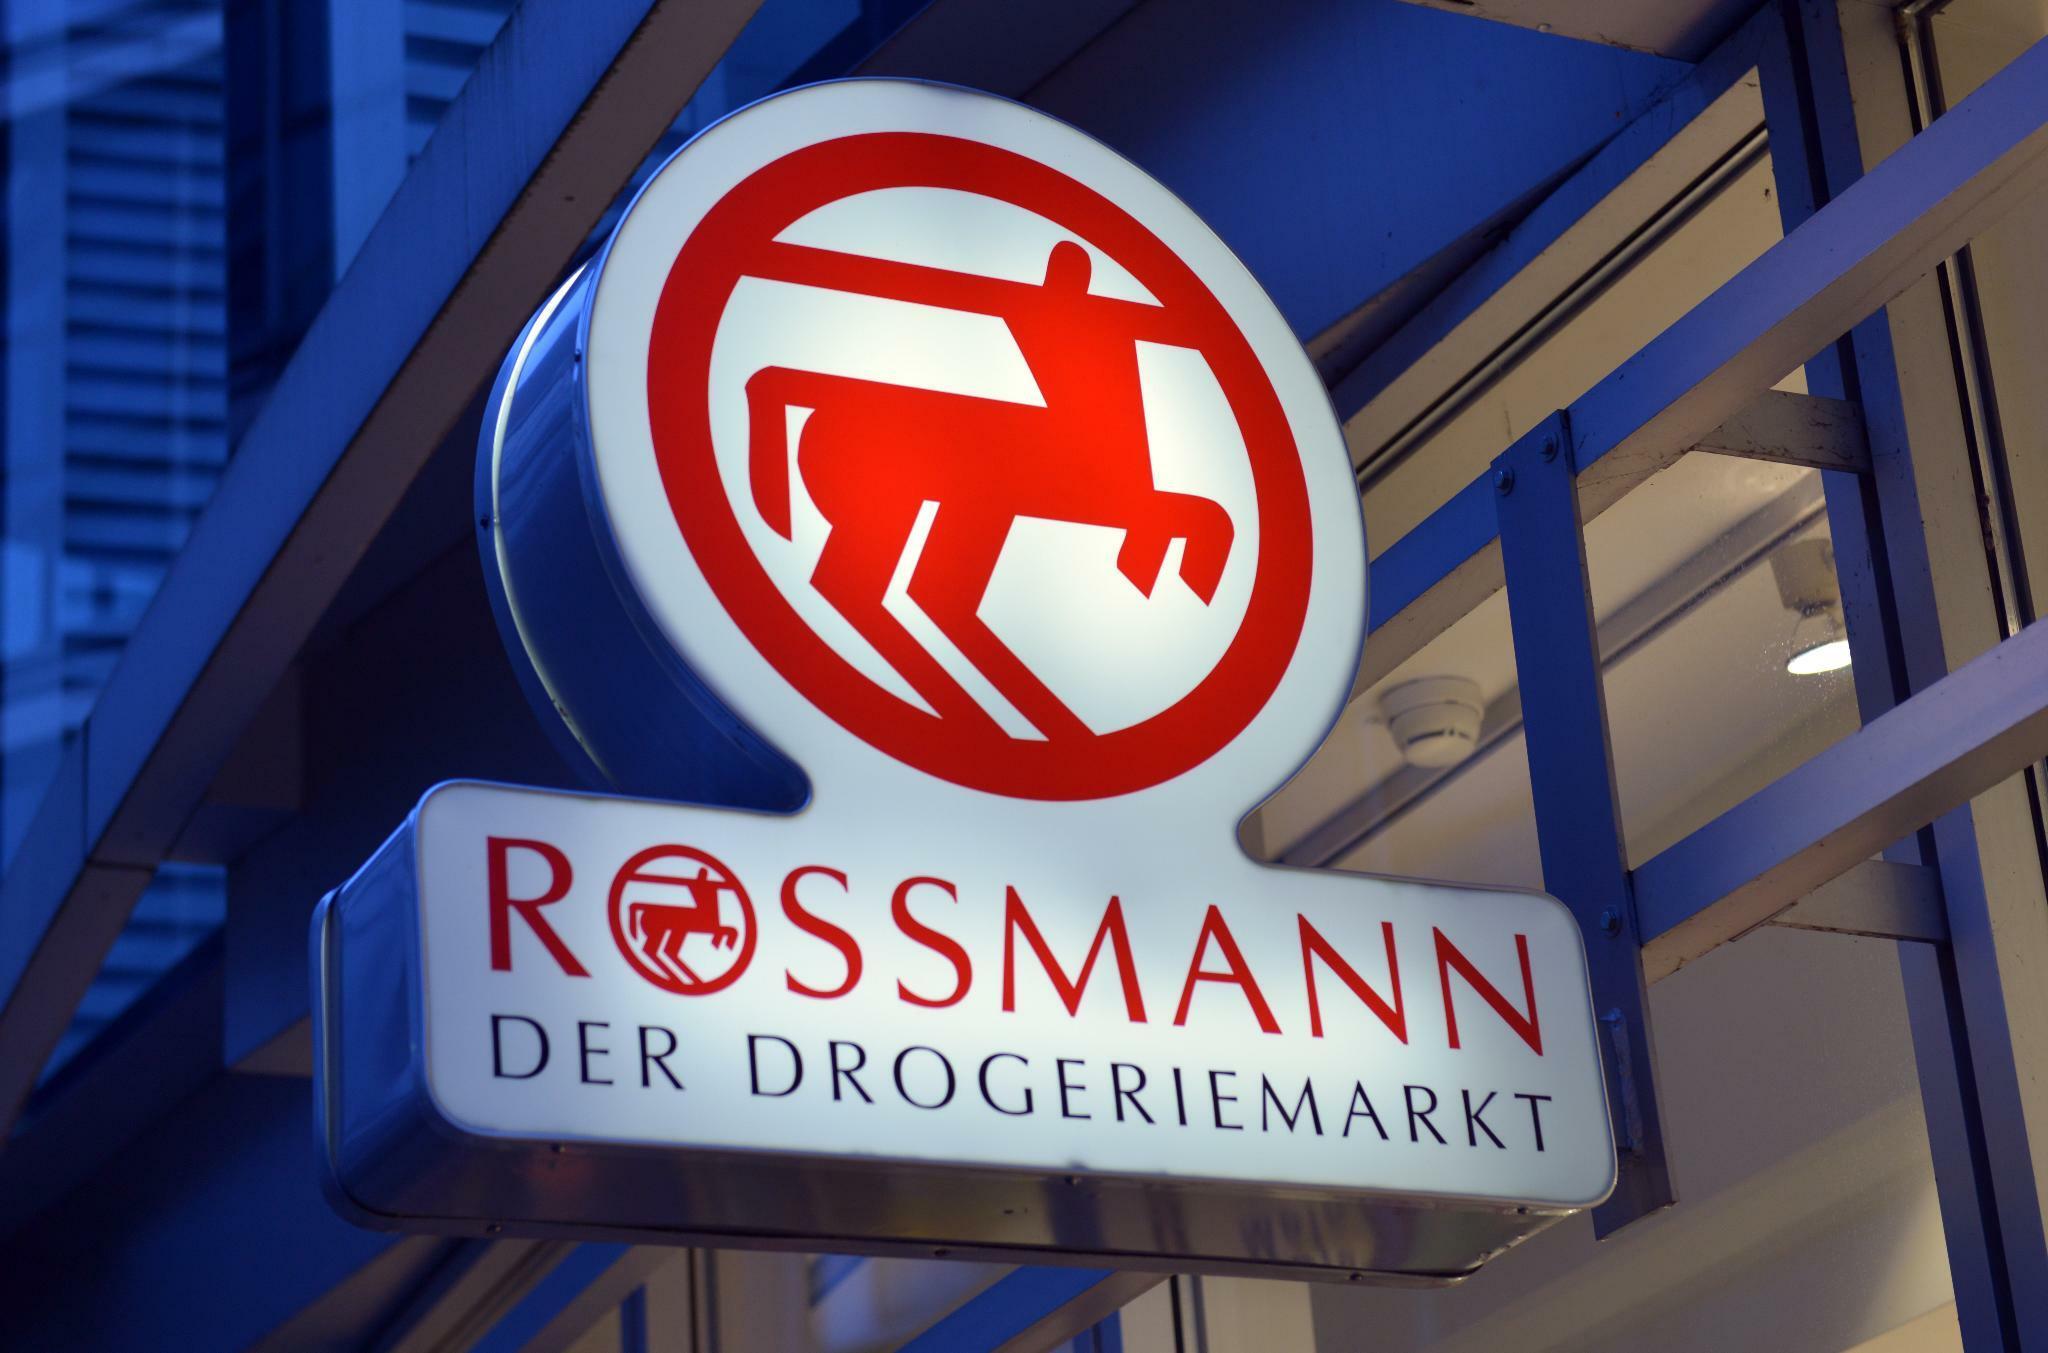 drogeriekette rossmann plant 230 neue filialen vor allem im ausland - Rossmann Online Bewerbung